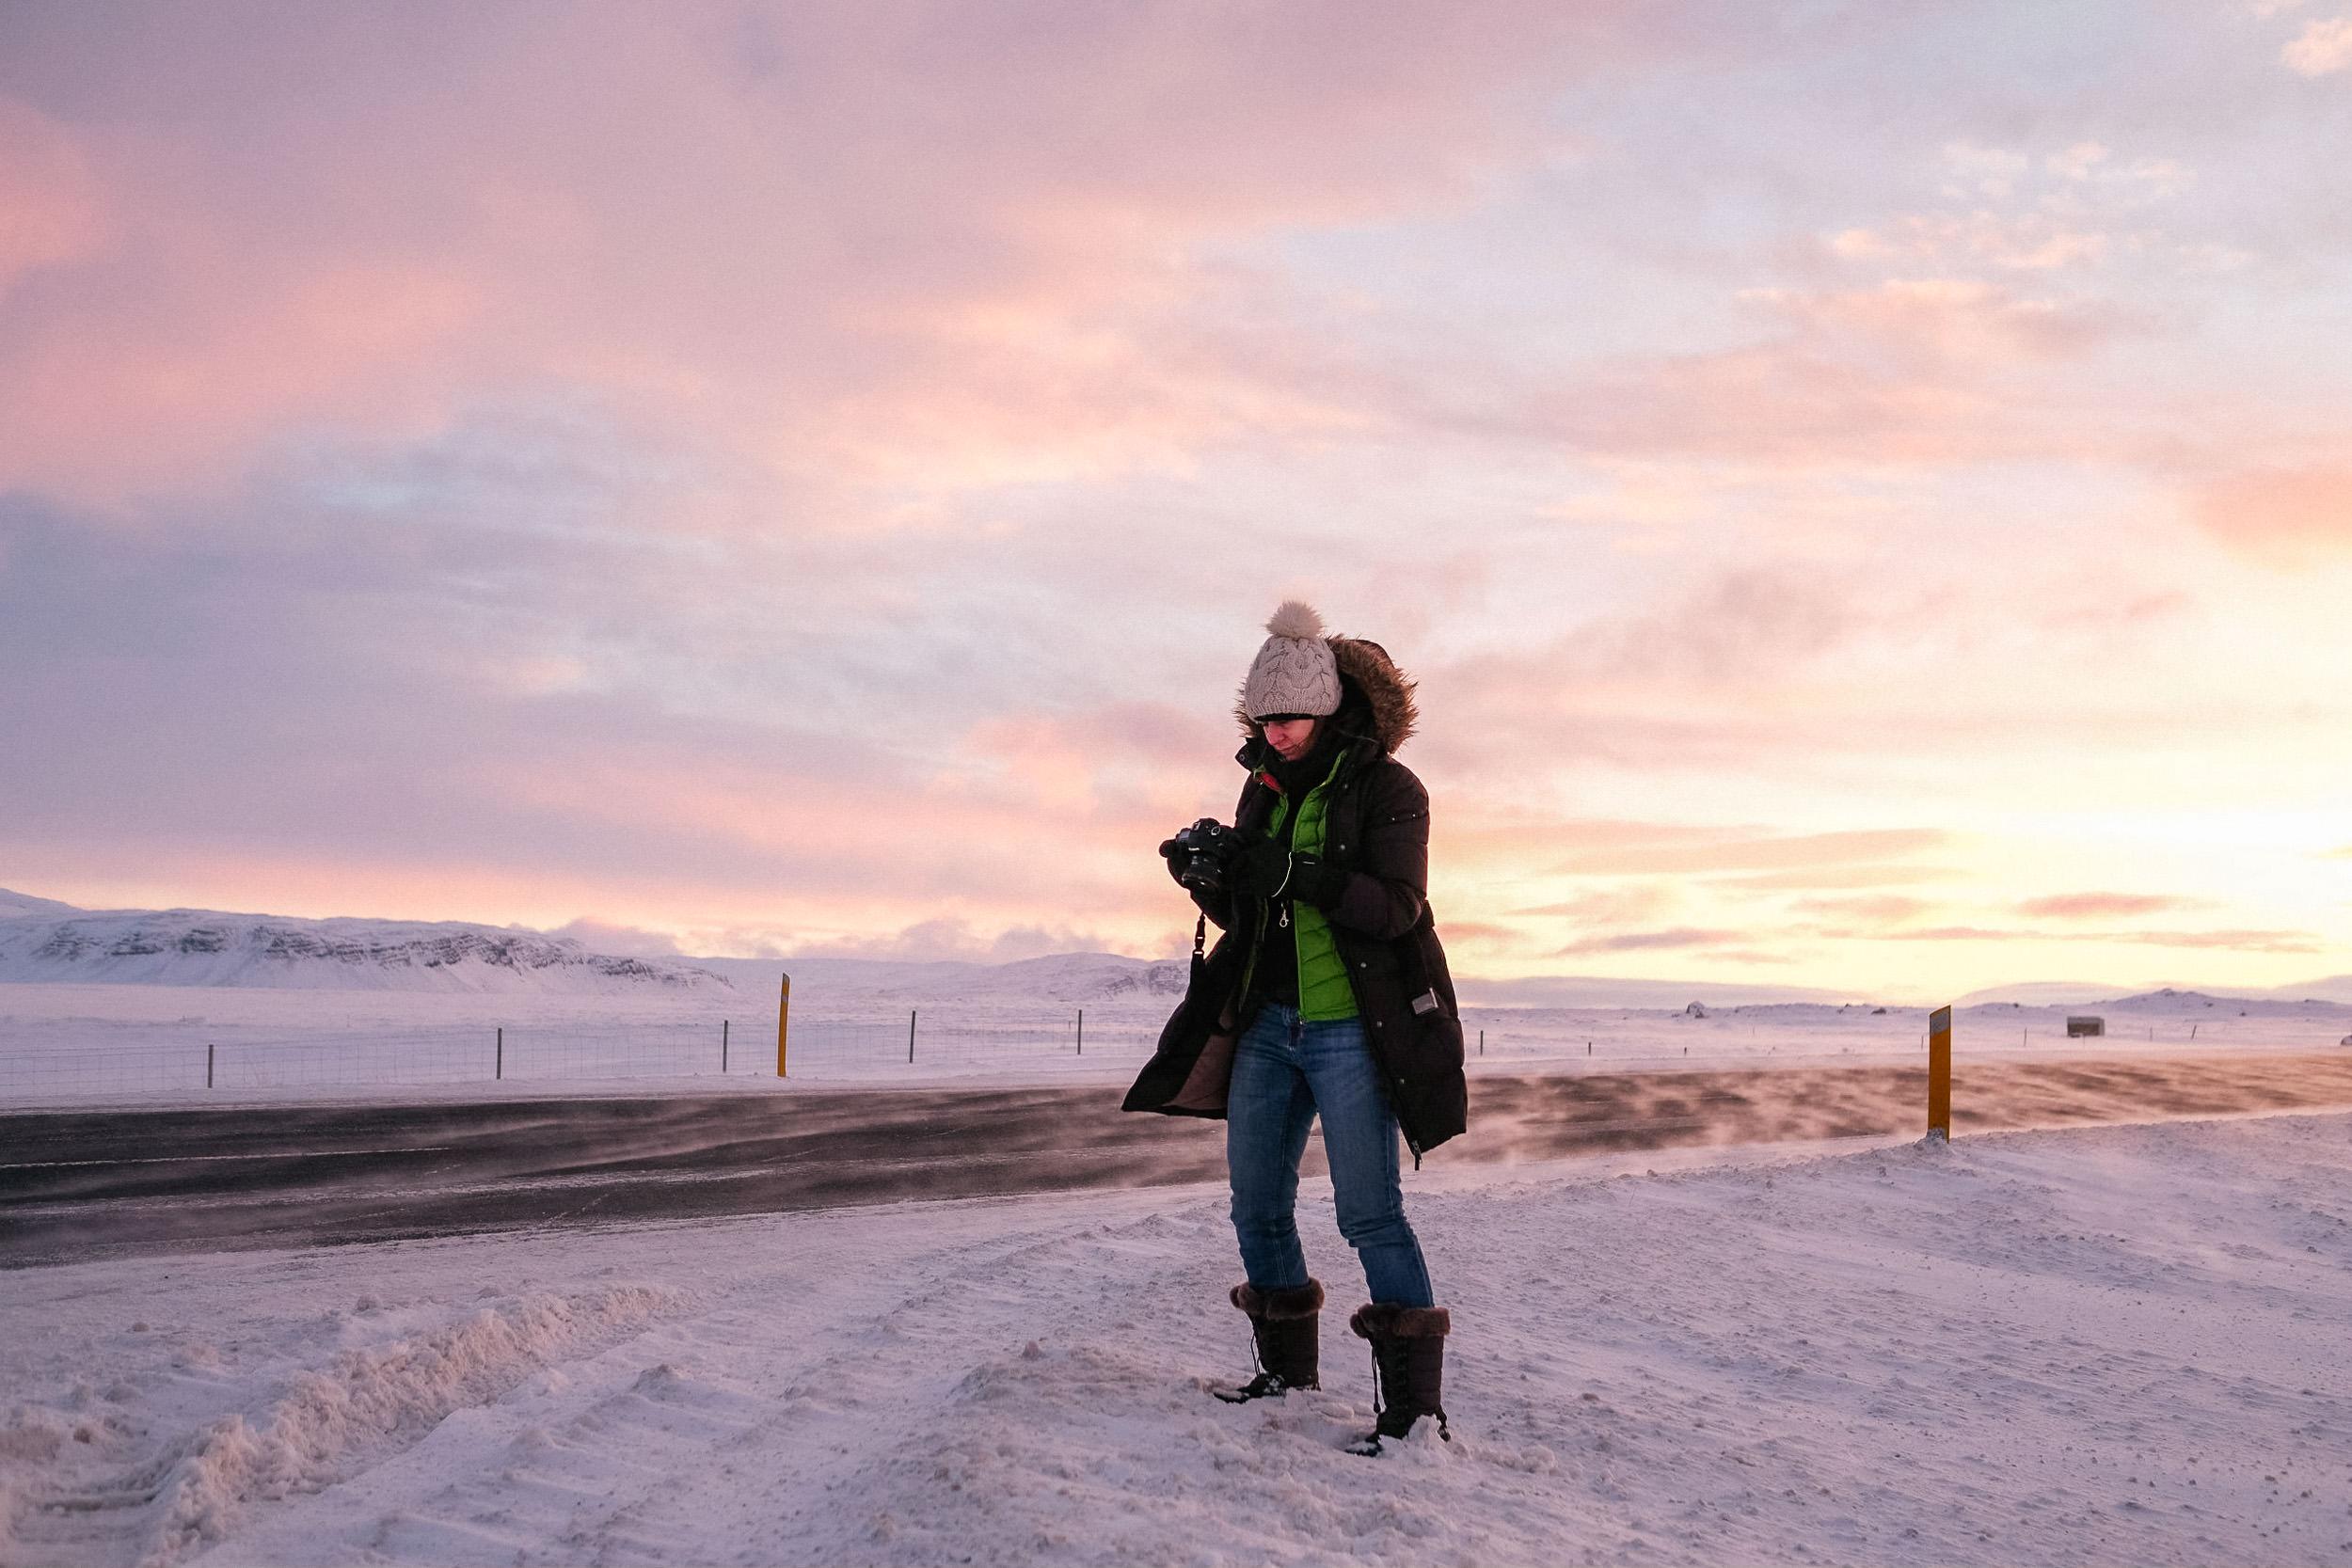 Collective_Wander_Iceland_Photographers_Trip_035.jpg